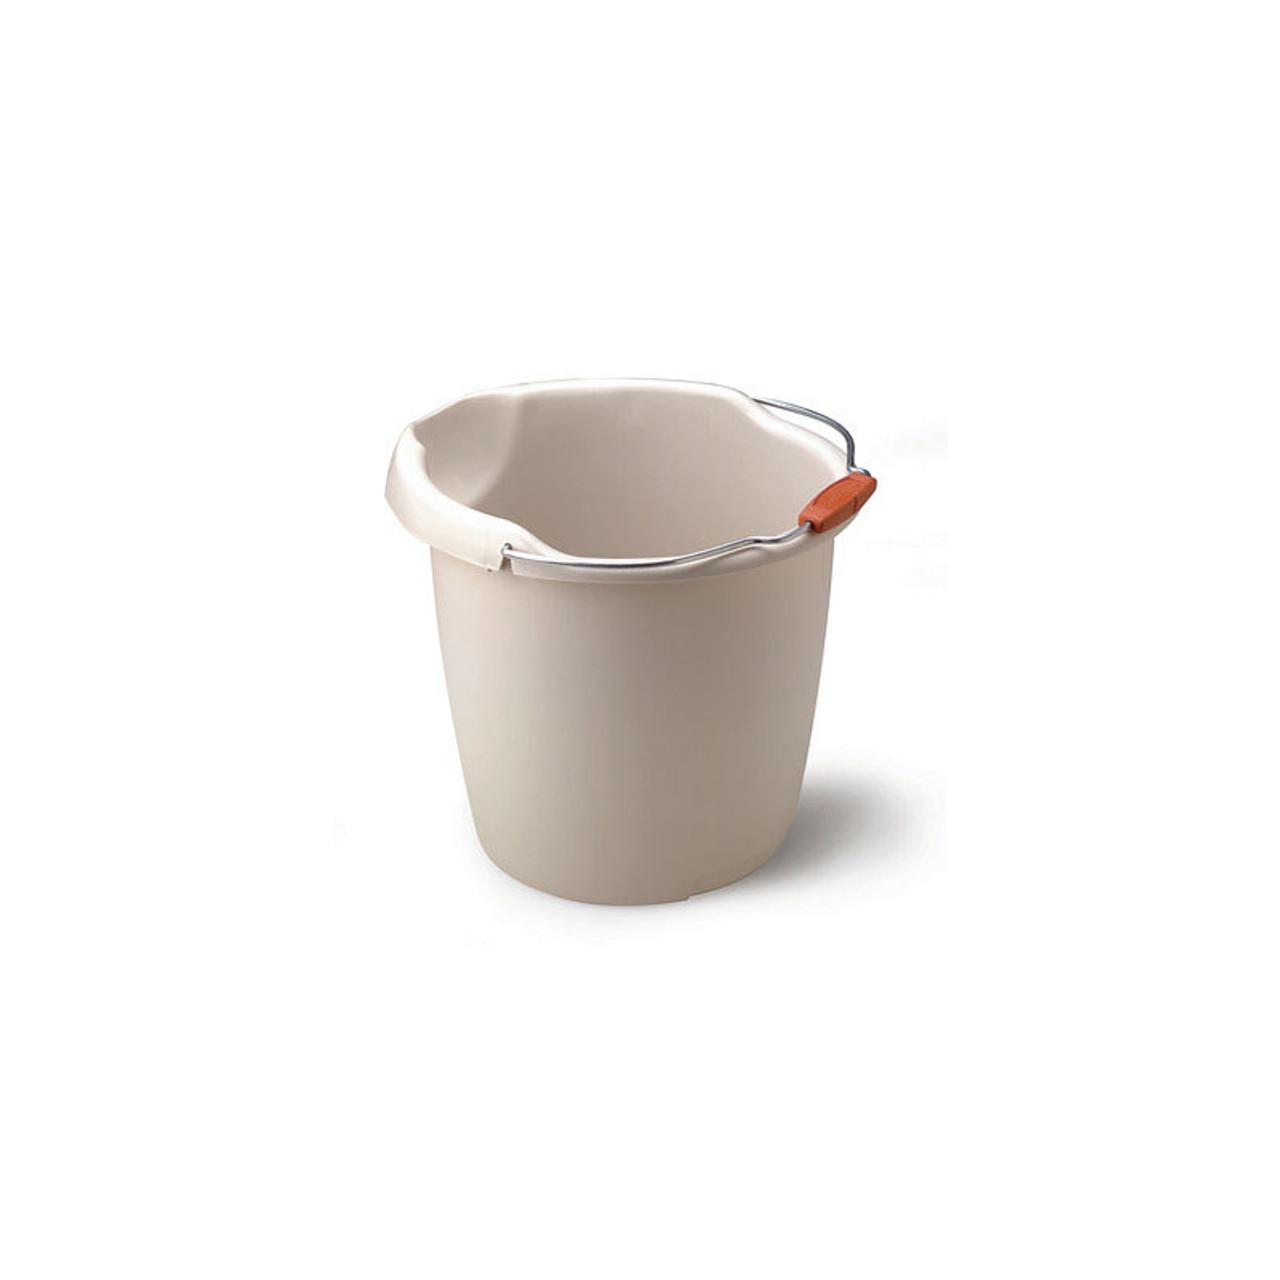 15-Quart Rubbermaid Bisque Bucket